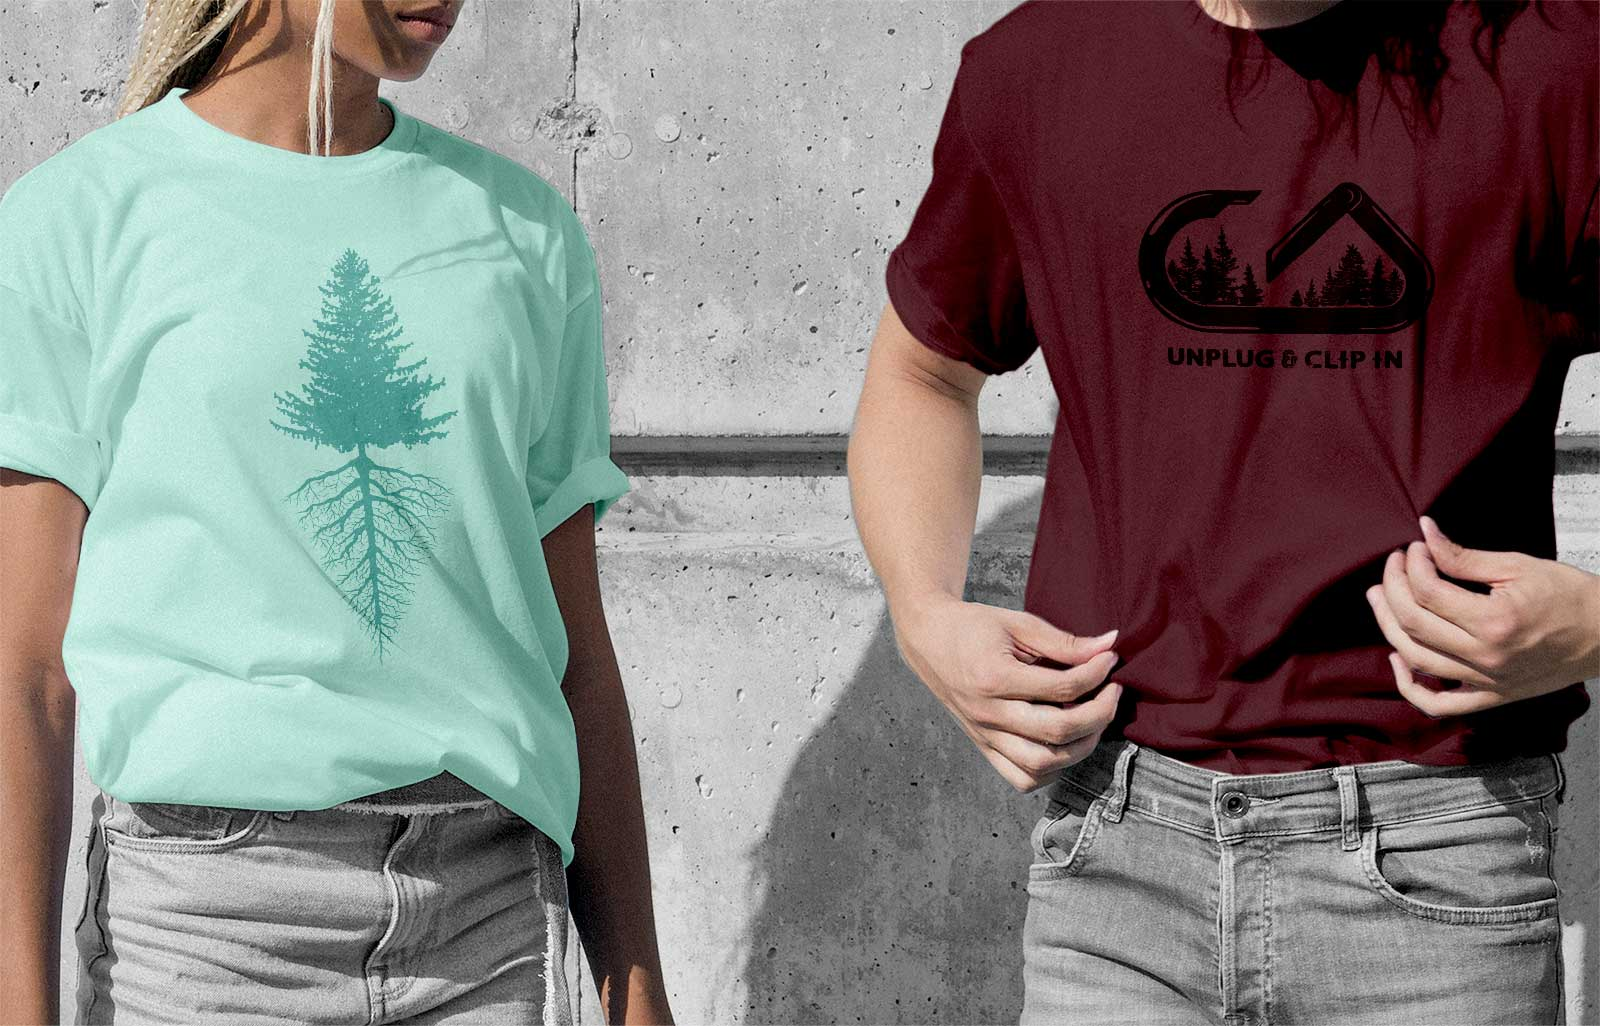 Boundless Adventures T-Shirt Design